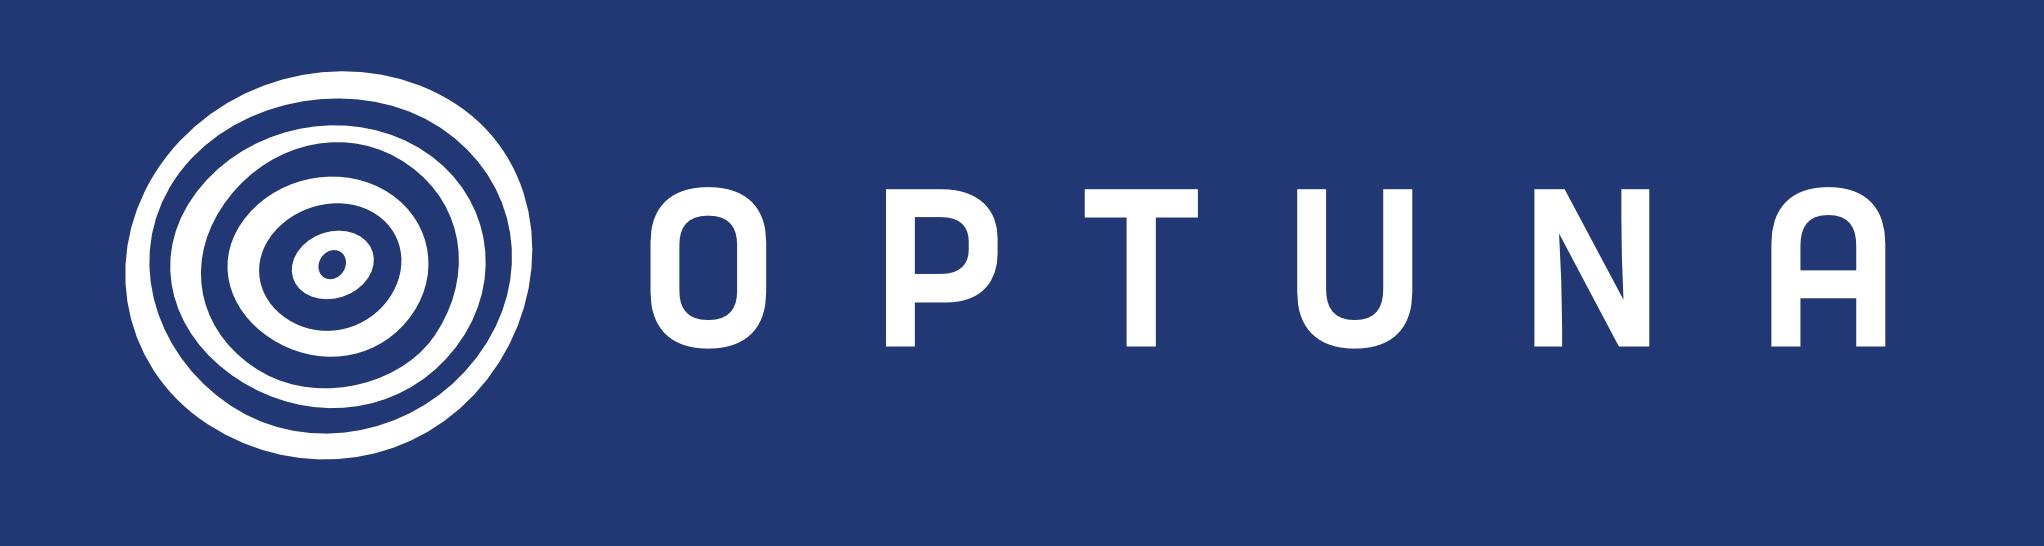 Announcing Optuna 2.0